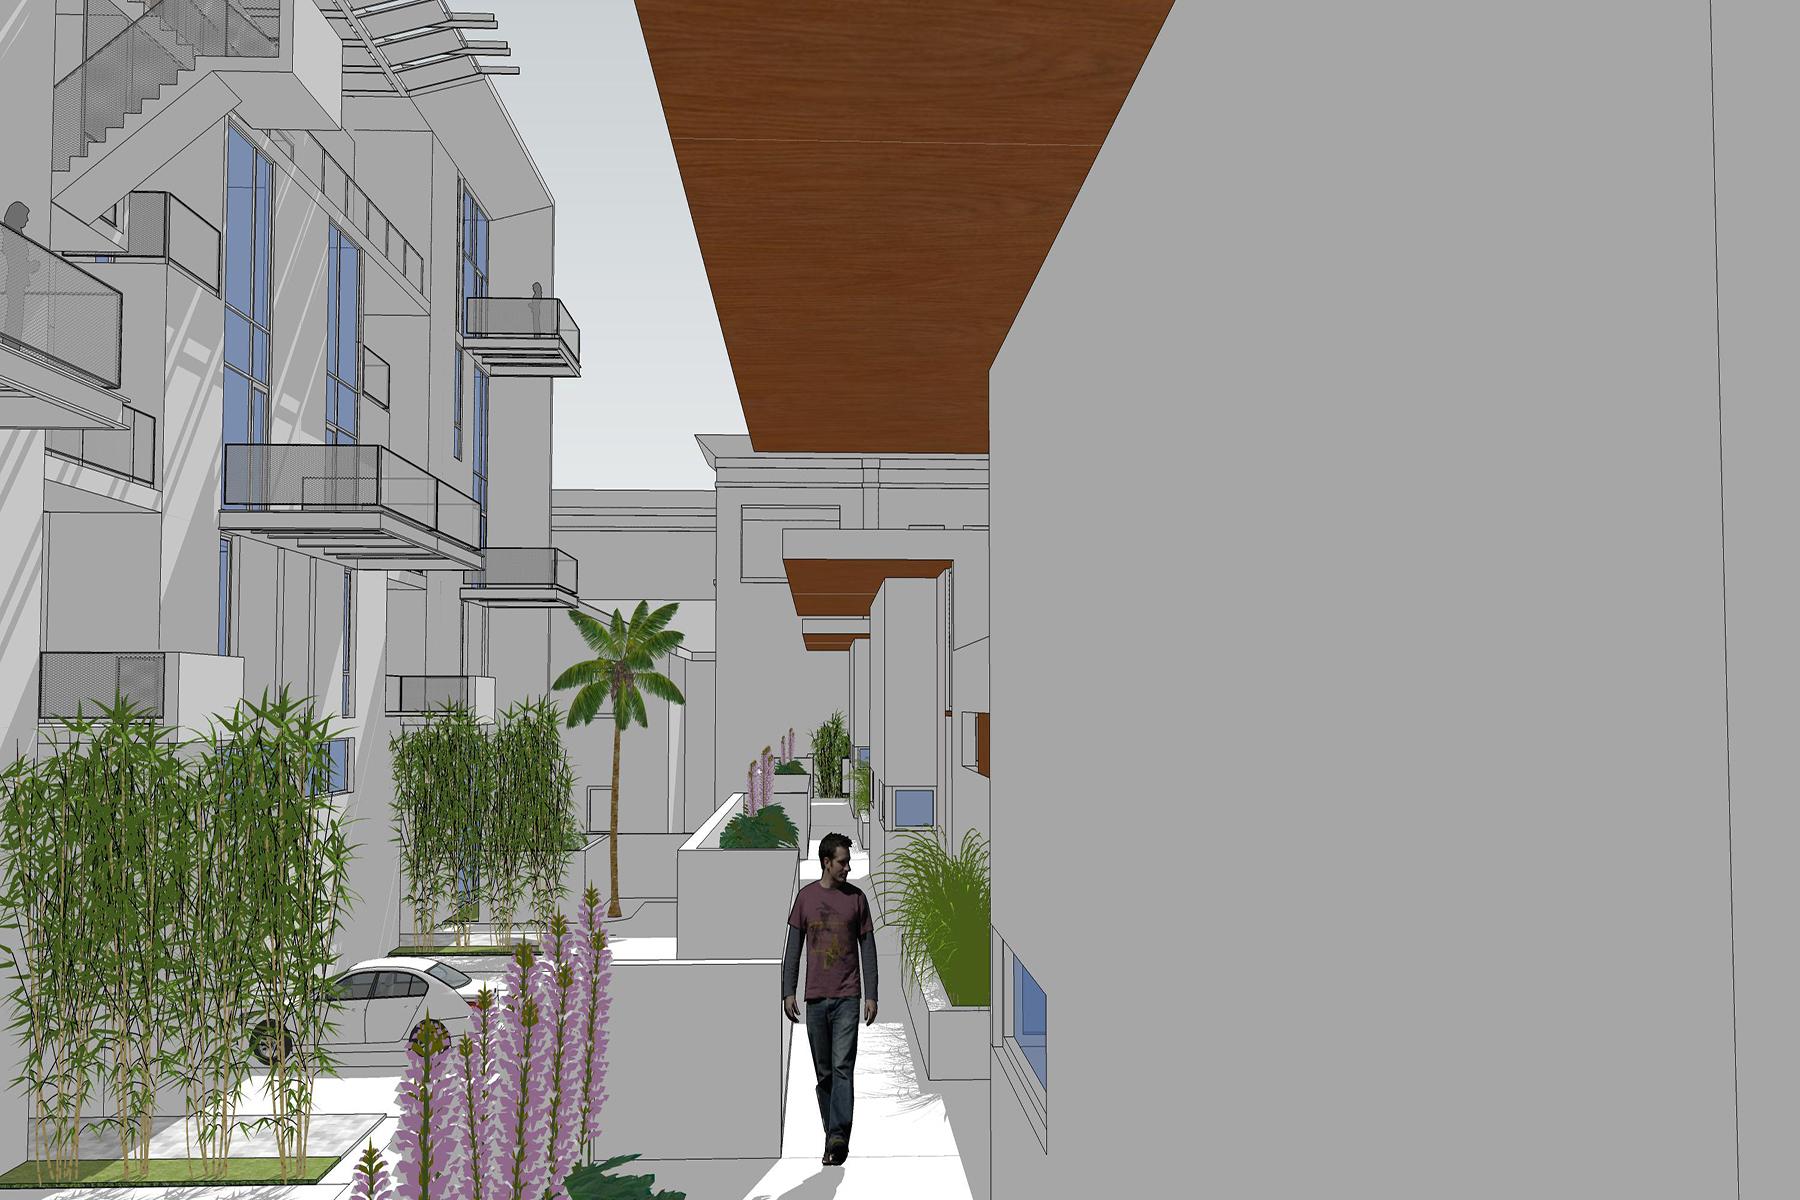 Additional photo for property listing at RISDON ON 5TH 1350  5th St 303,  Sarasota, Florida 34236 United States